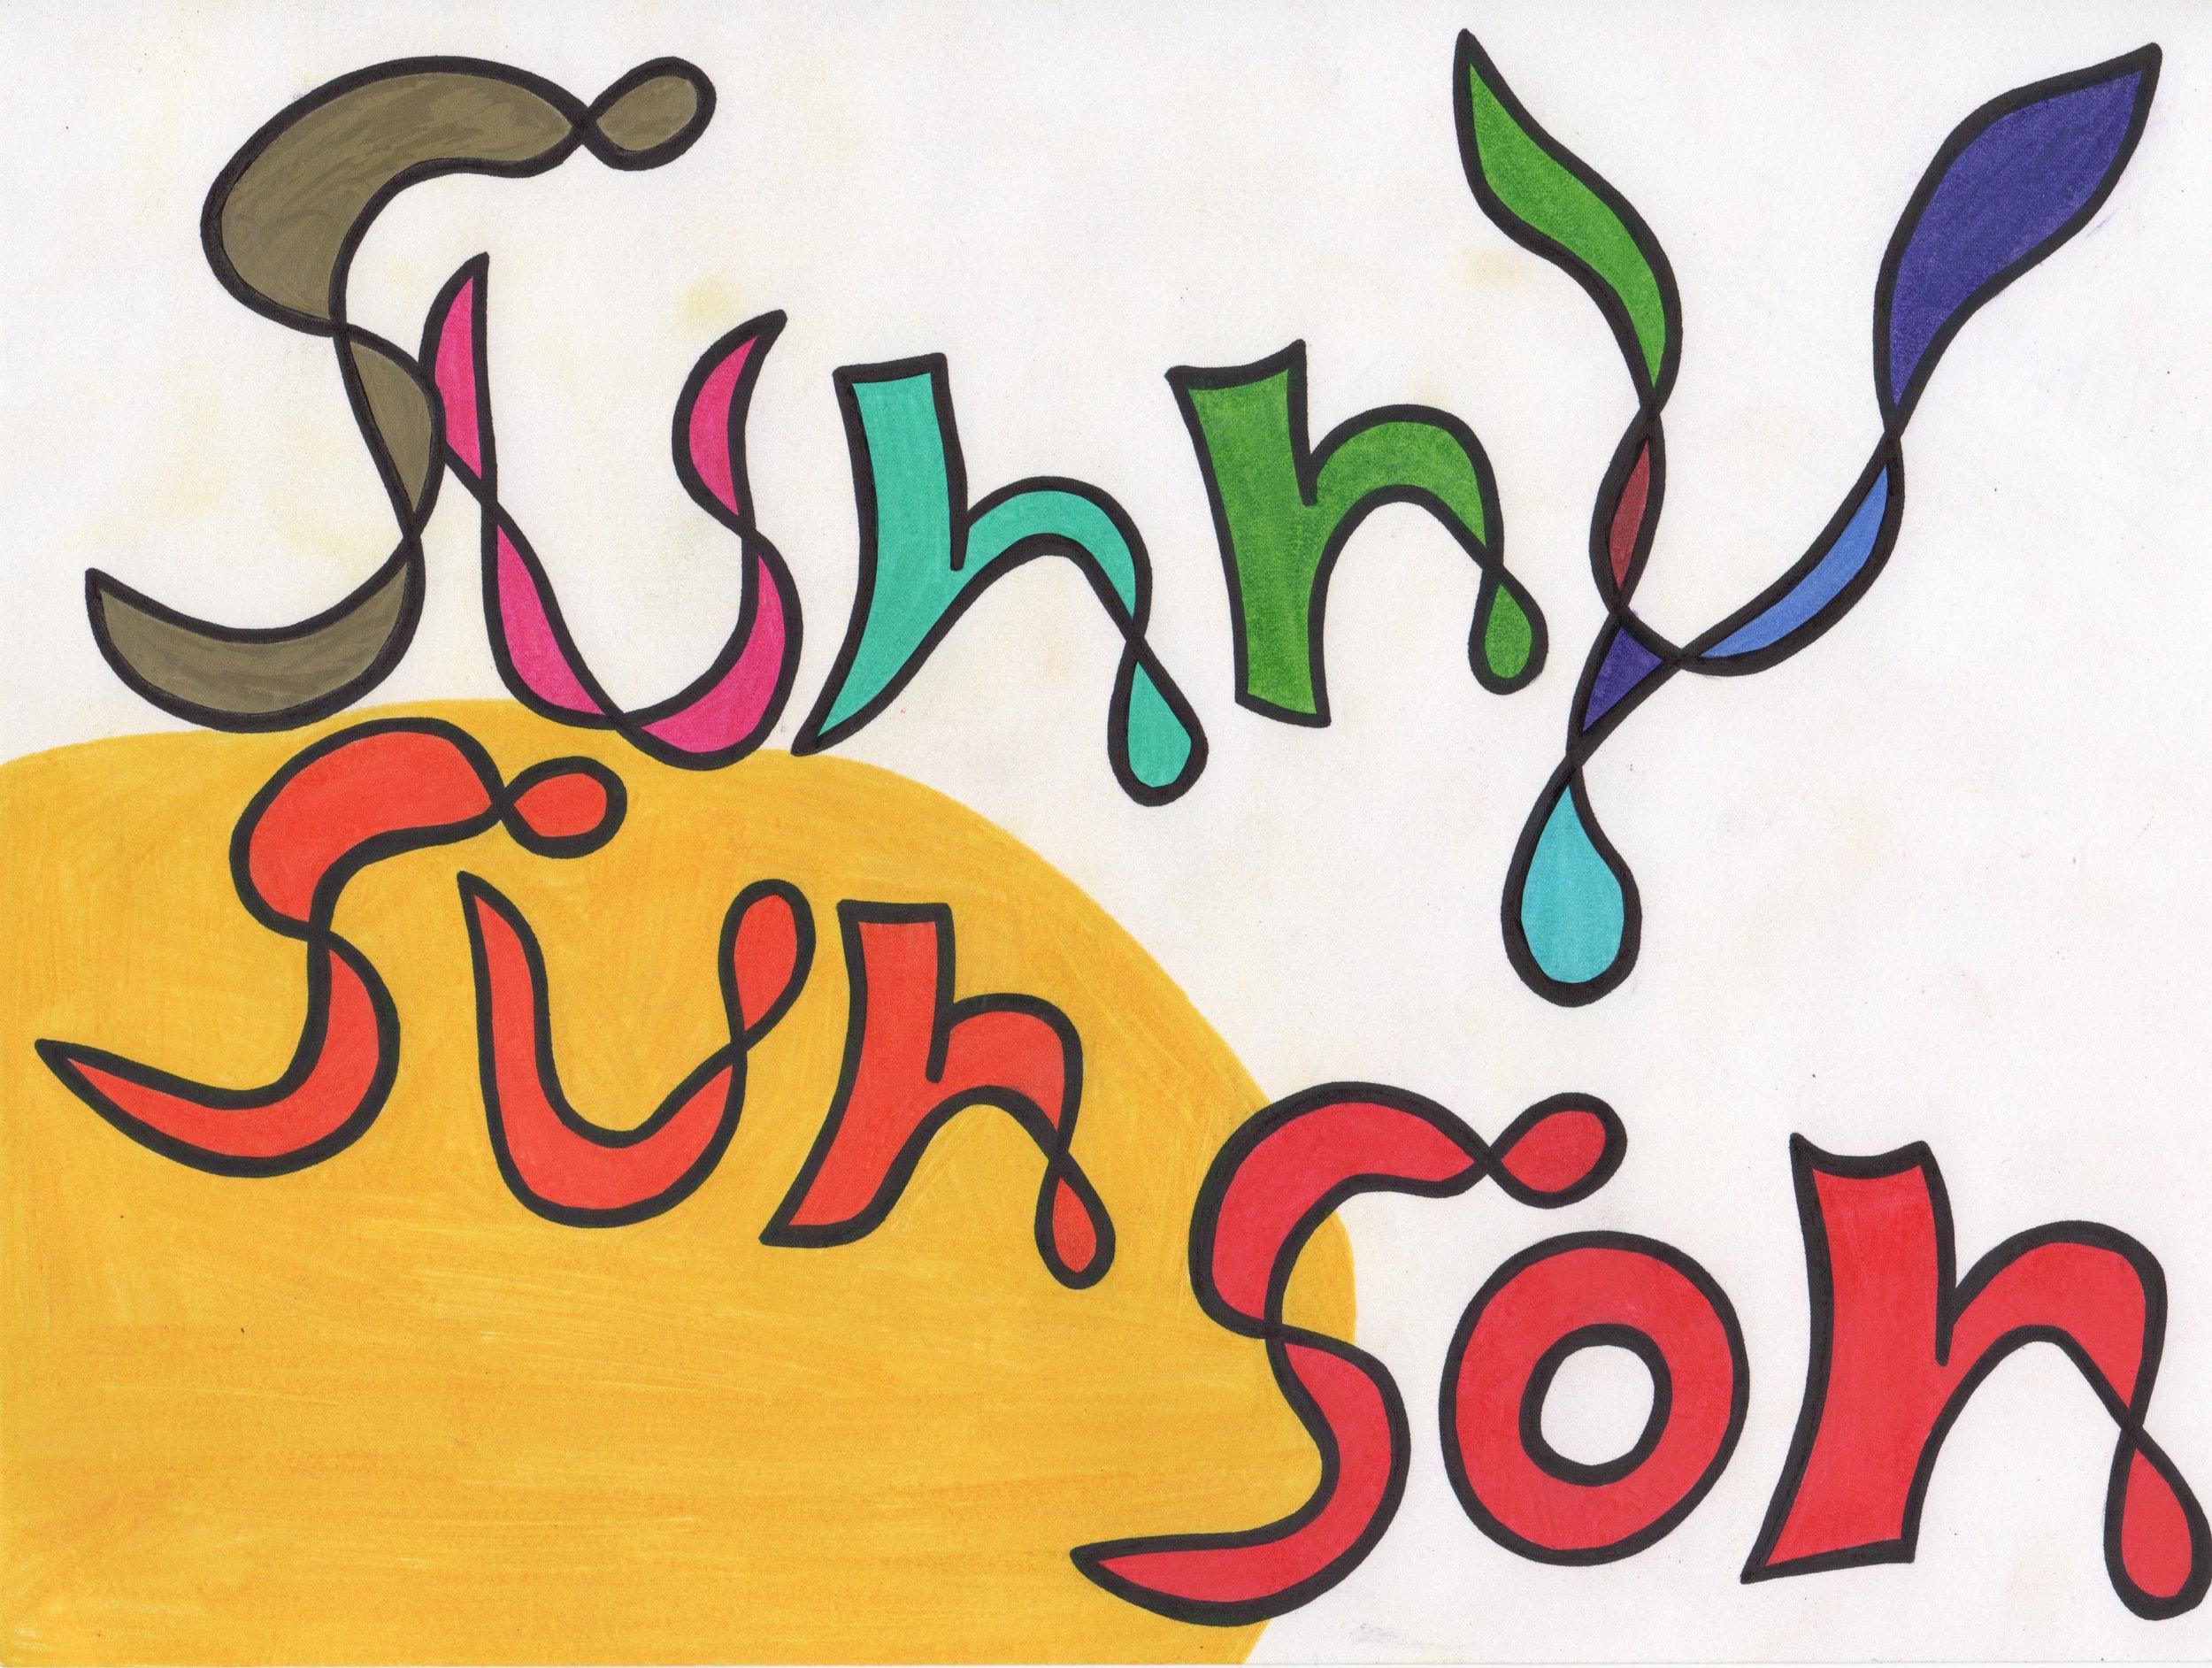 Sunny Sun Son copy.jpeg